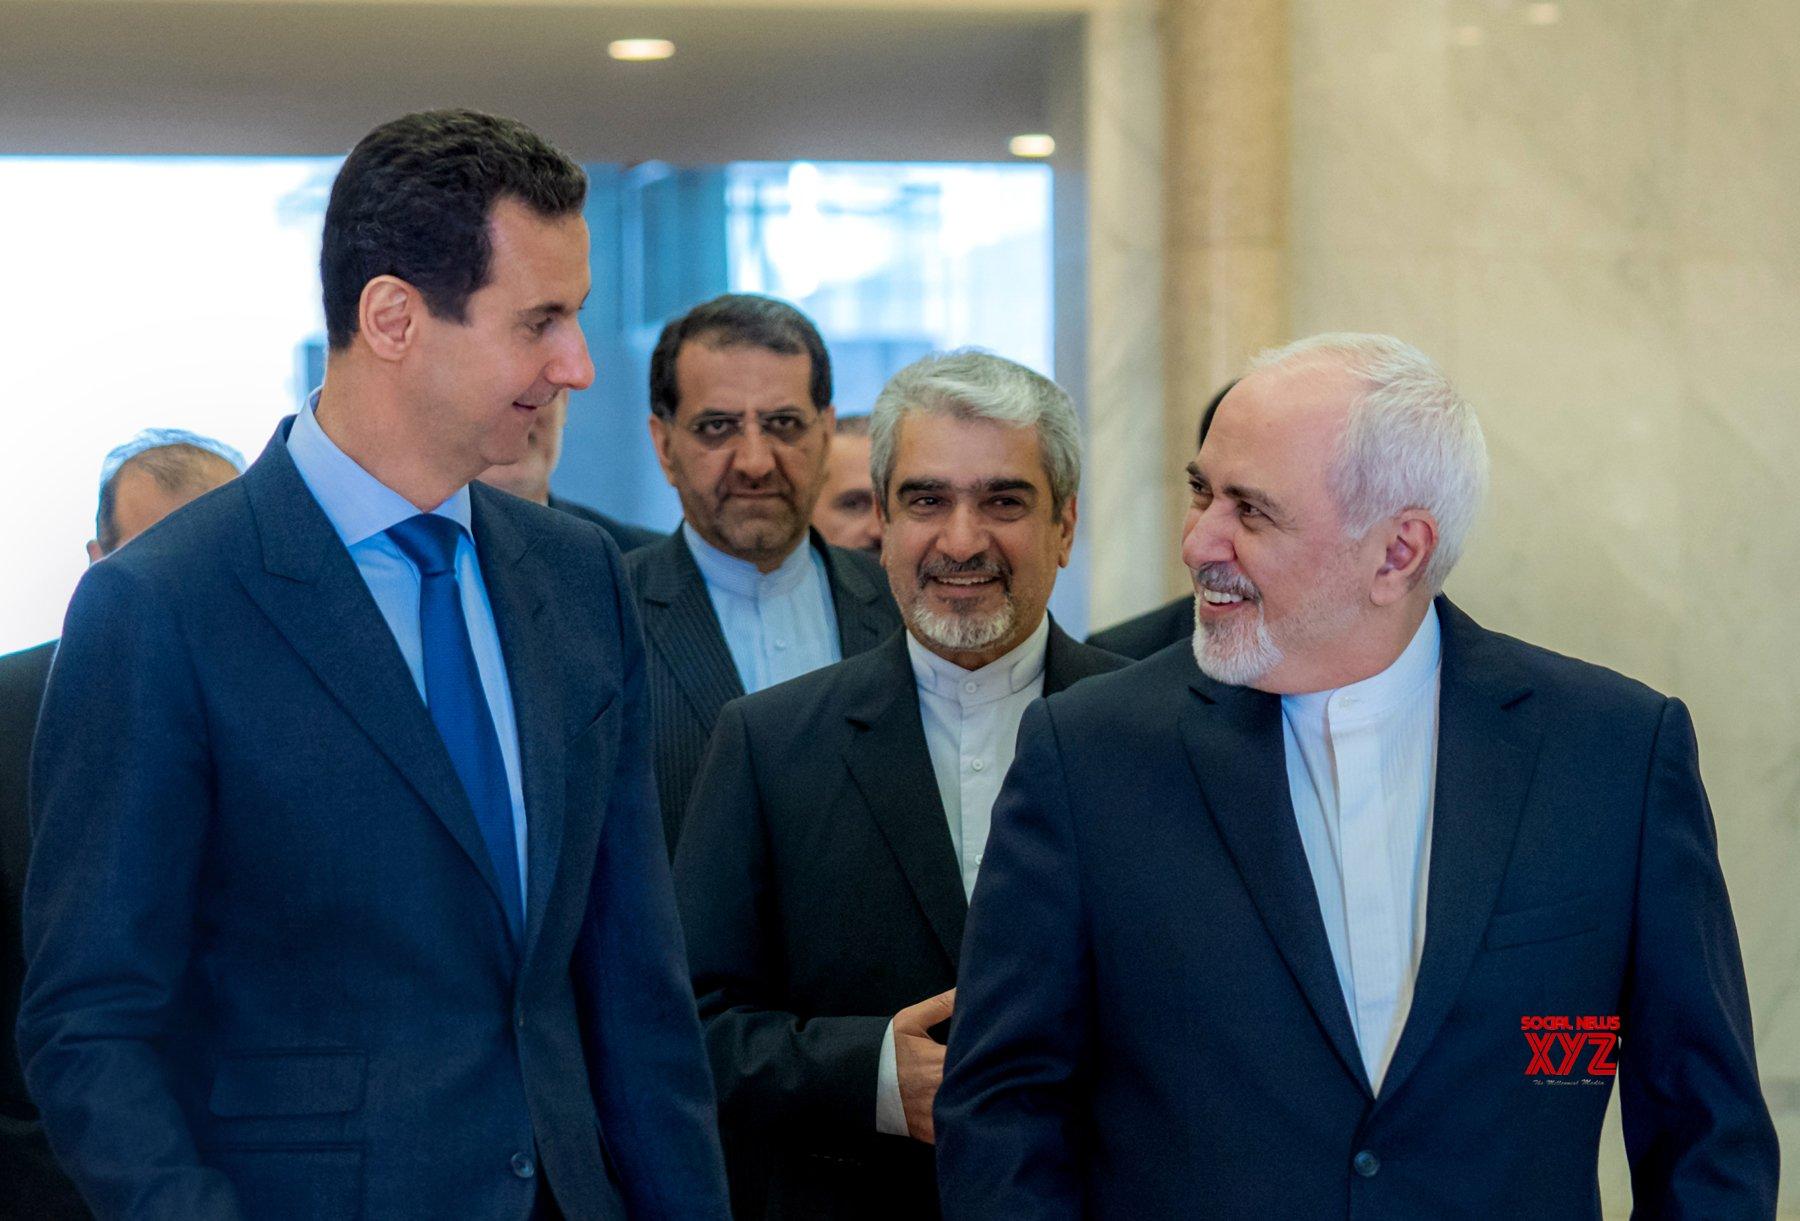 SYRIA - DAMASCUS - PRESIDENT - IRAN - FM - MEETING #Gallery